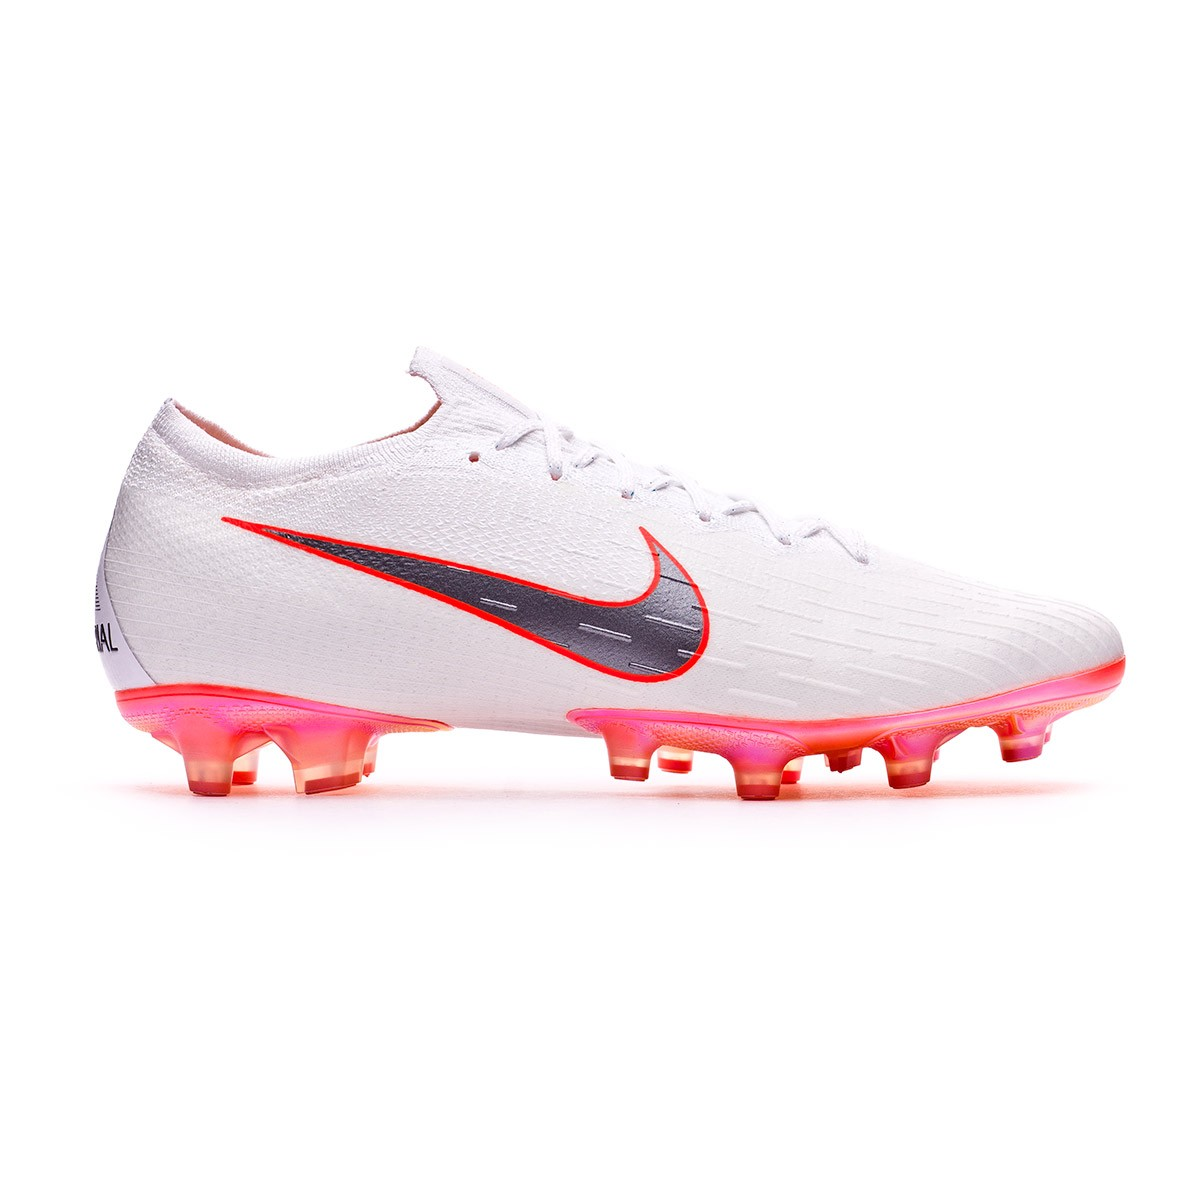 Boot Nike Mercurial Vapor XII Elite AG-Pro White-Metallic cool grey-Total  orange - Football store Fútbol Emotion 825c9c2a5a906